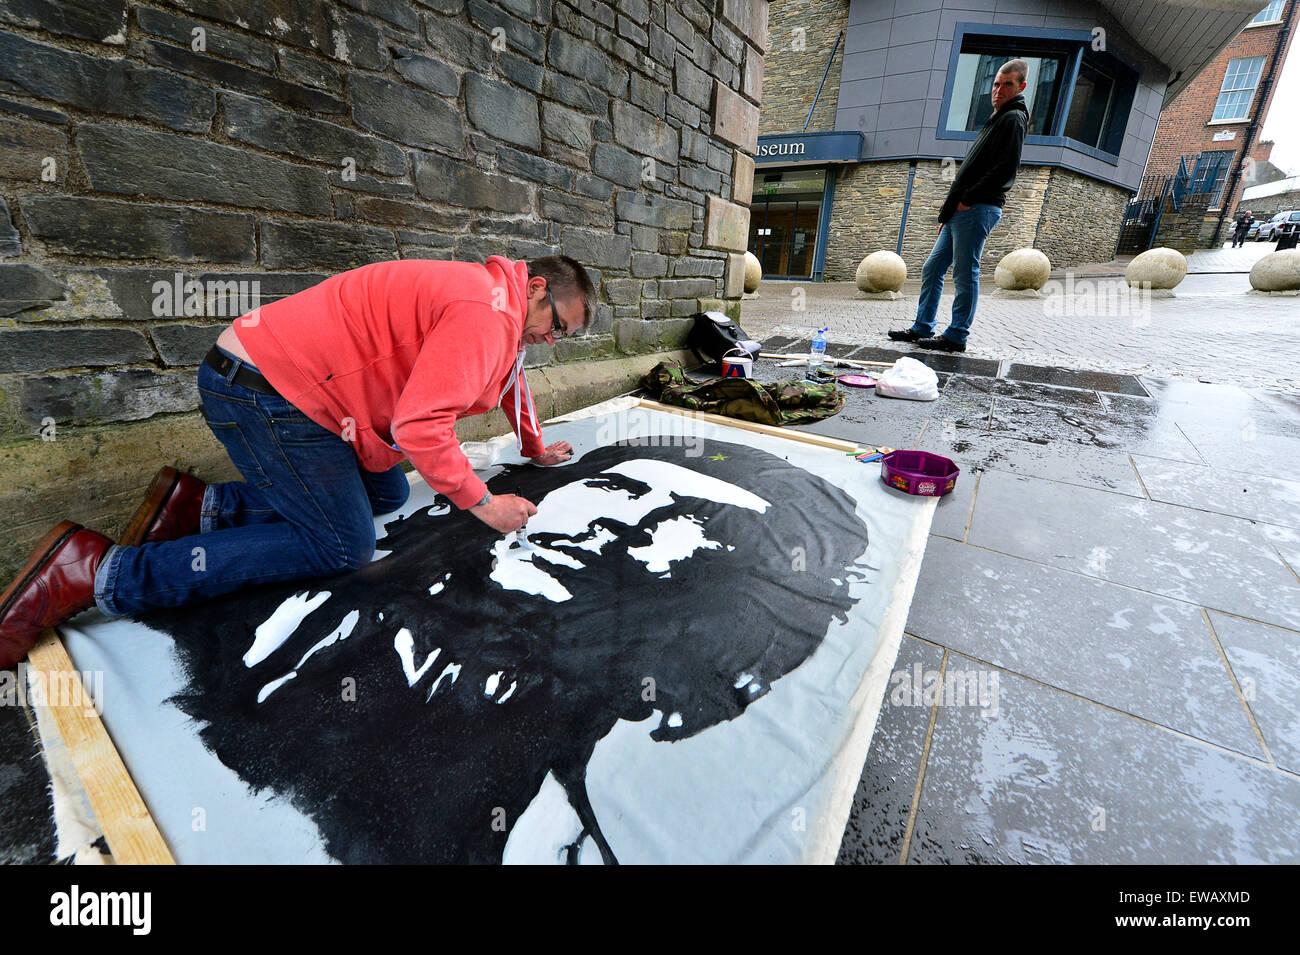 Street artist recreating iconic Che Guevara (Ernesto Guevara de la Serna) portrait, Londonderry (Derry), Northern - Stock Image